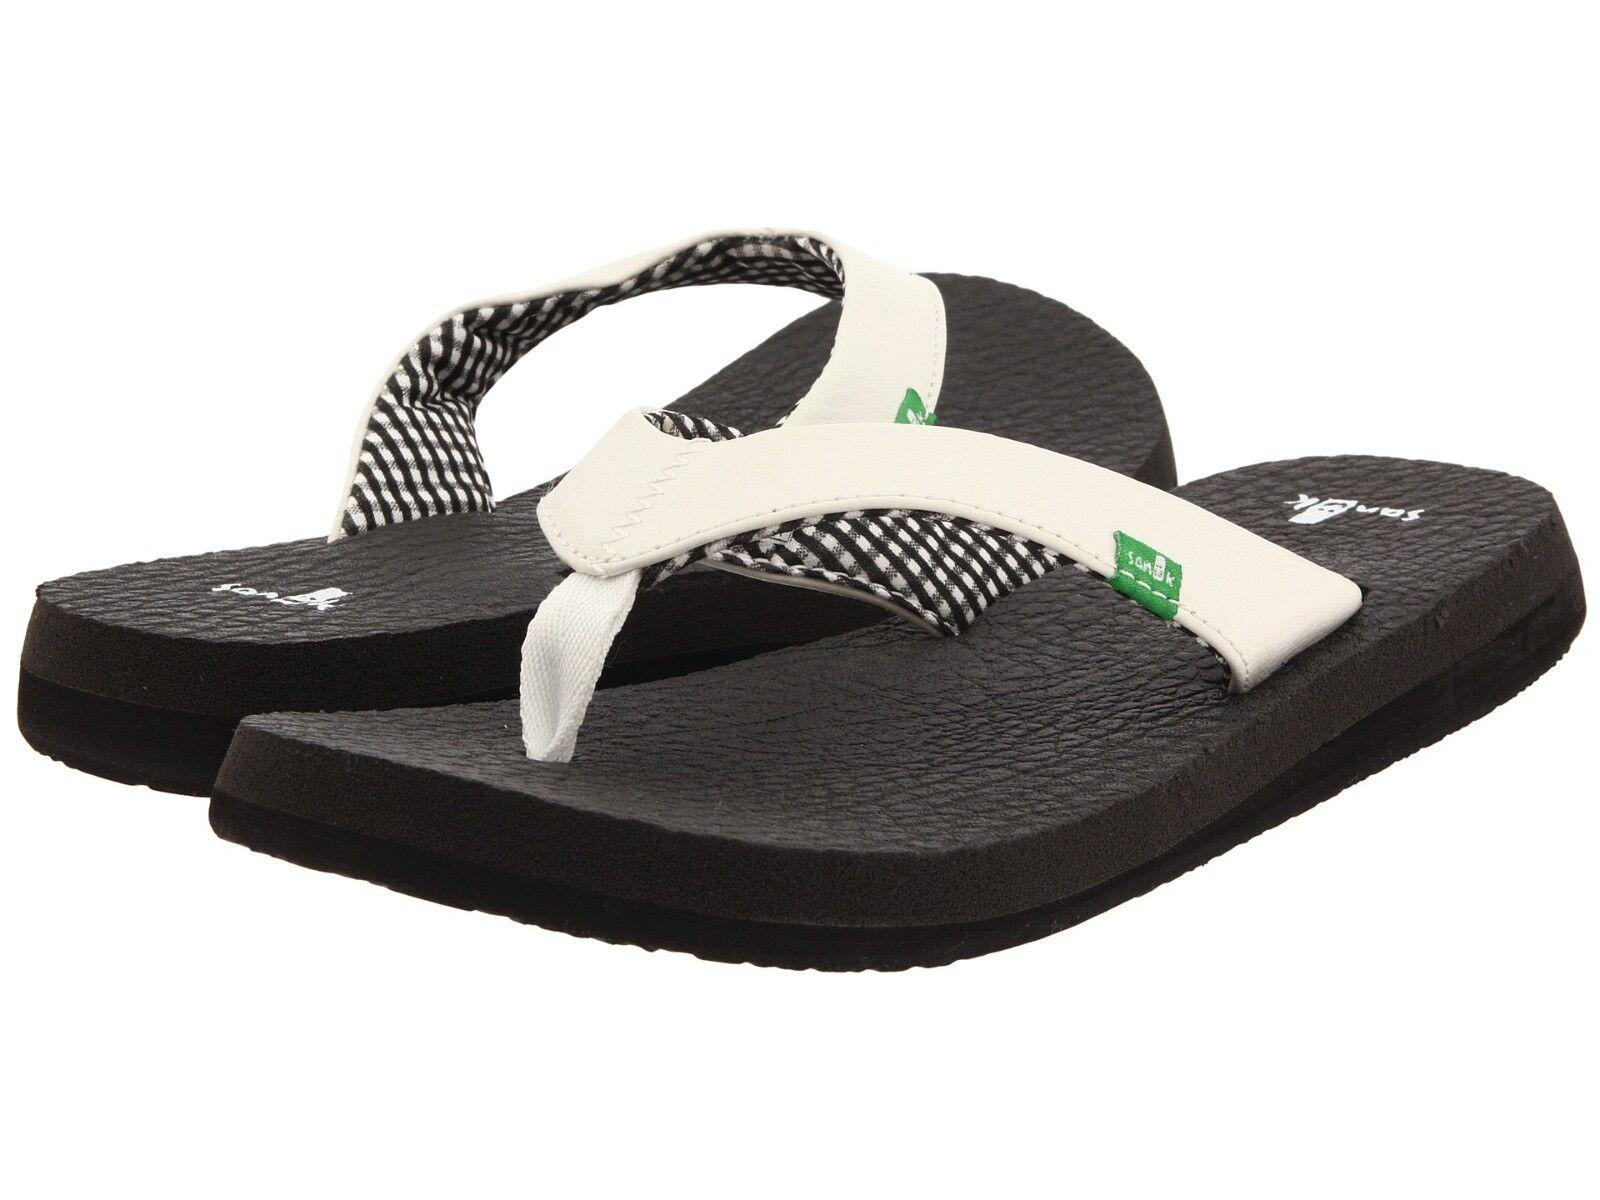 Women's Shoes Sanuk Yoga Mat Casual White Flip Flop Sandals SWS2908 White Casual *New* 502a30